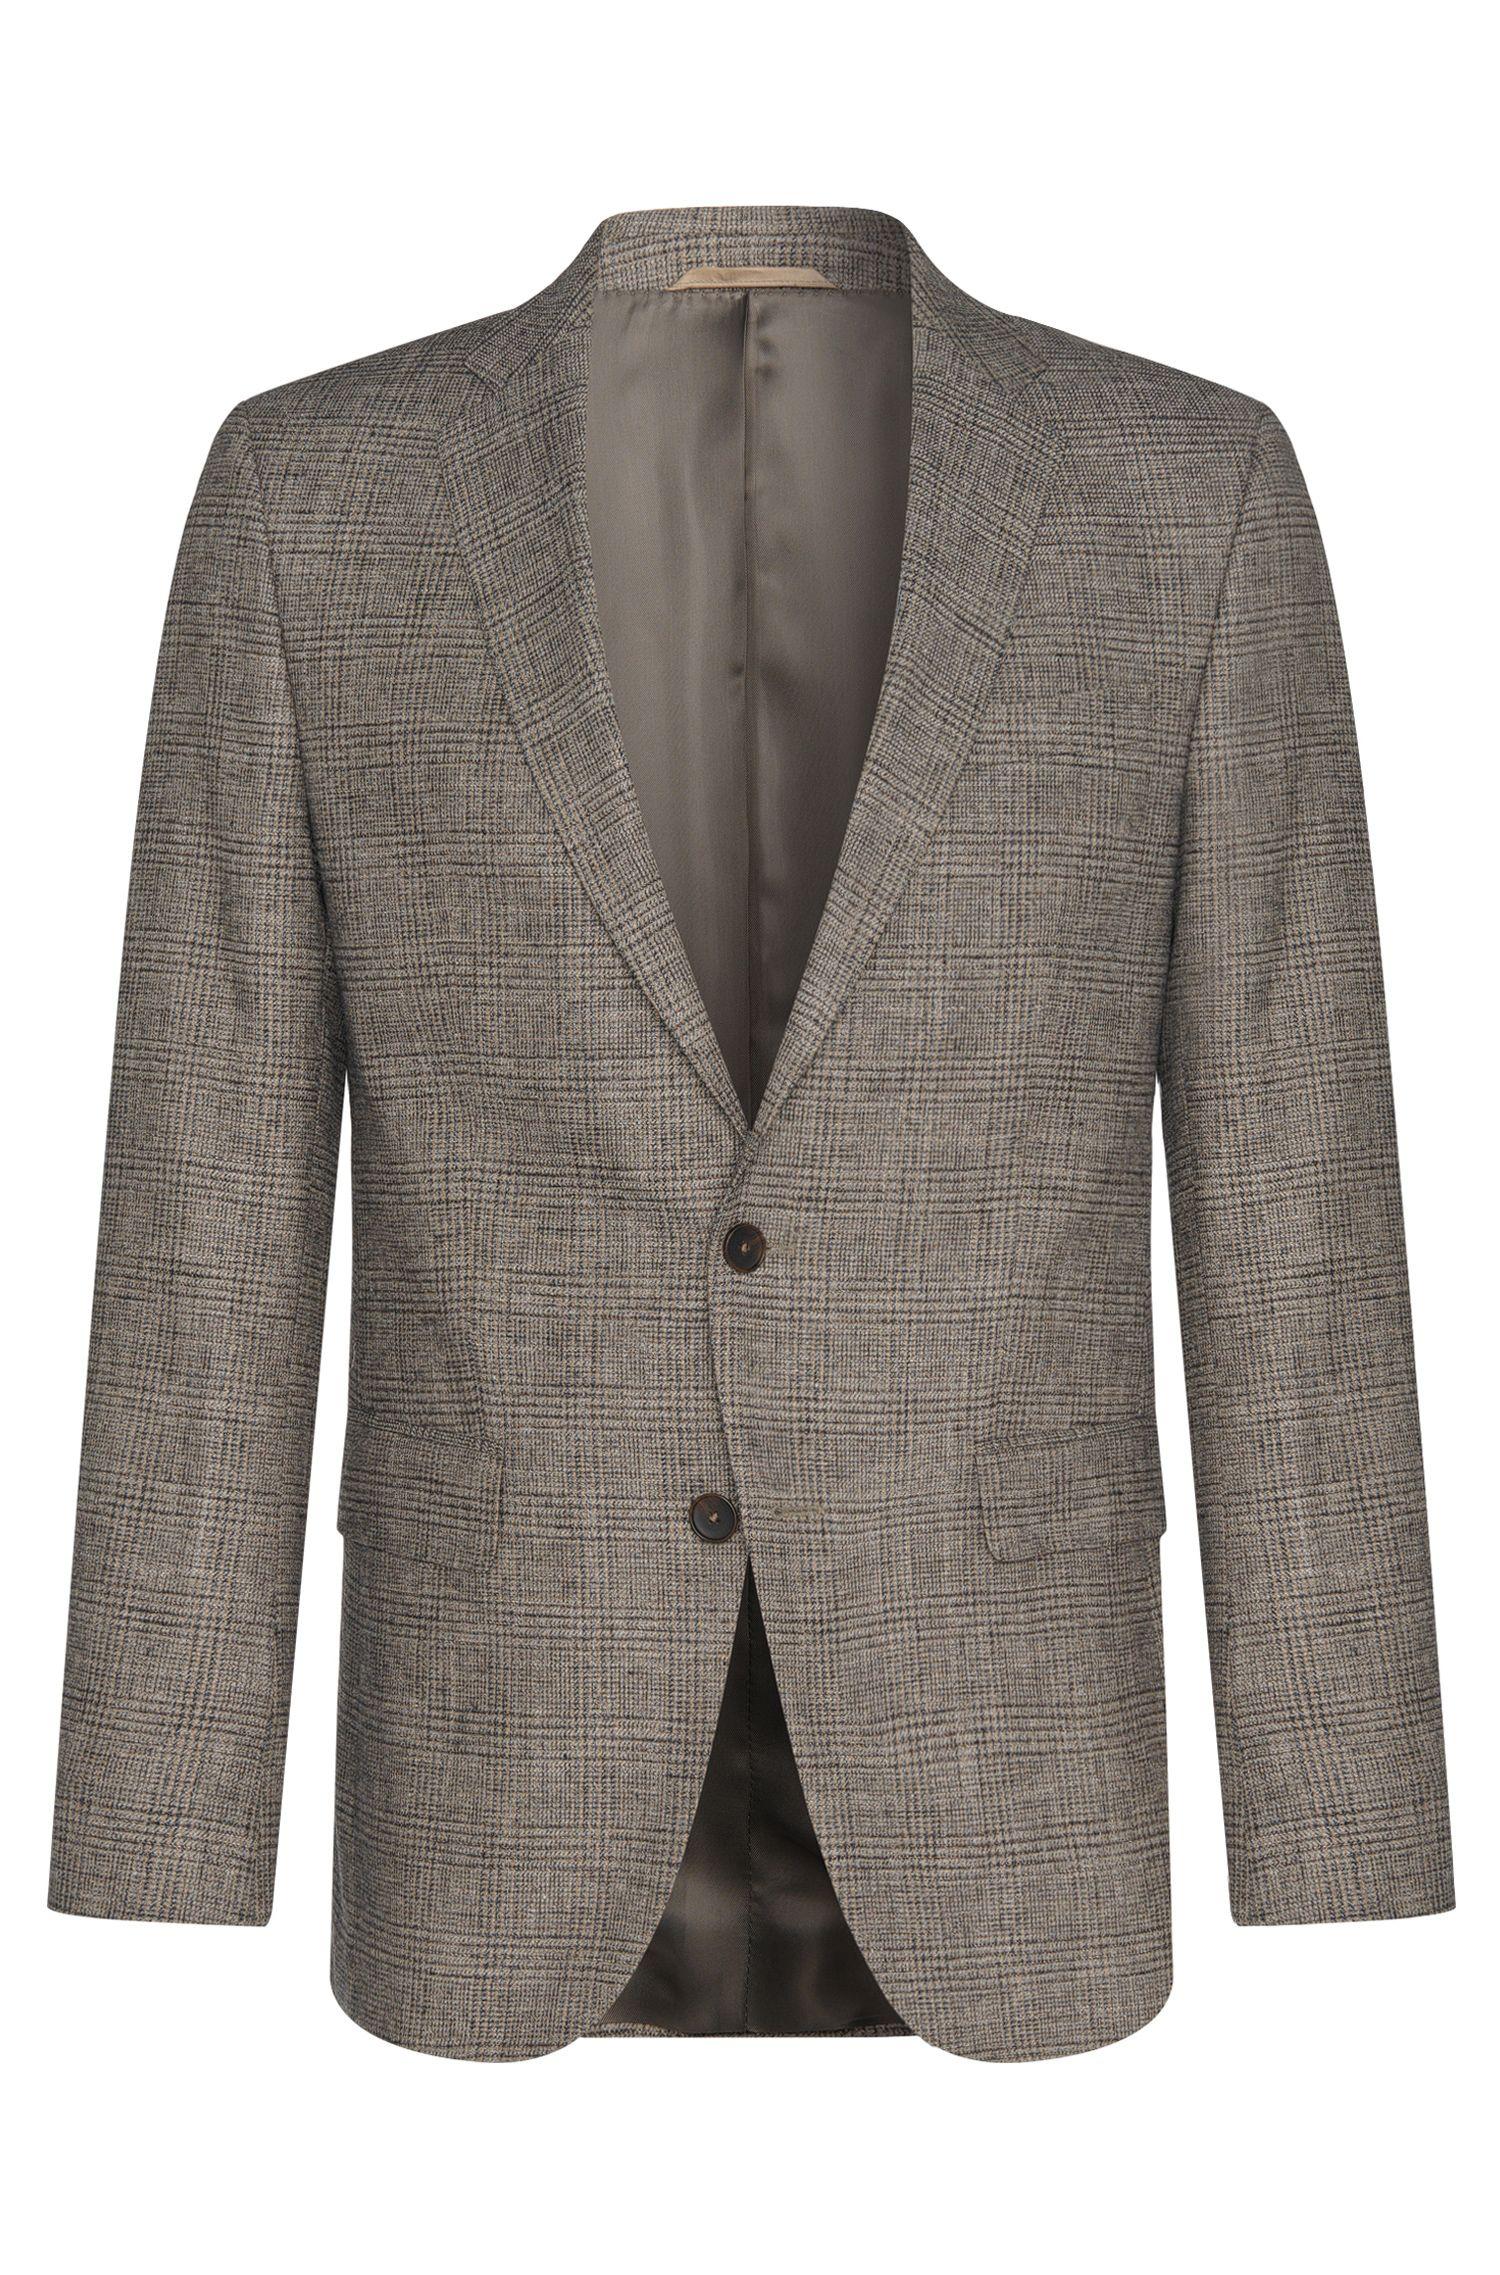 'Nasley' | Slim Fit, Virgin Wool Cotton Blend Sport Coat